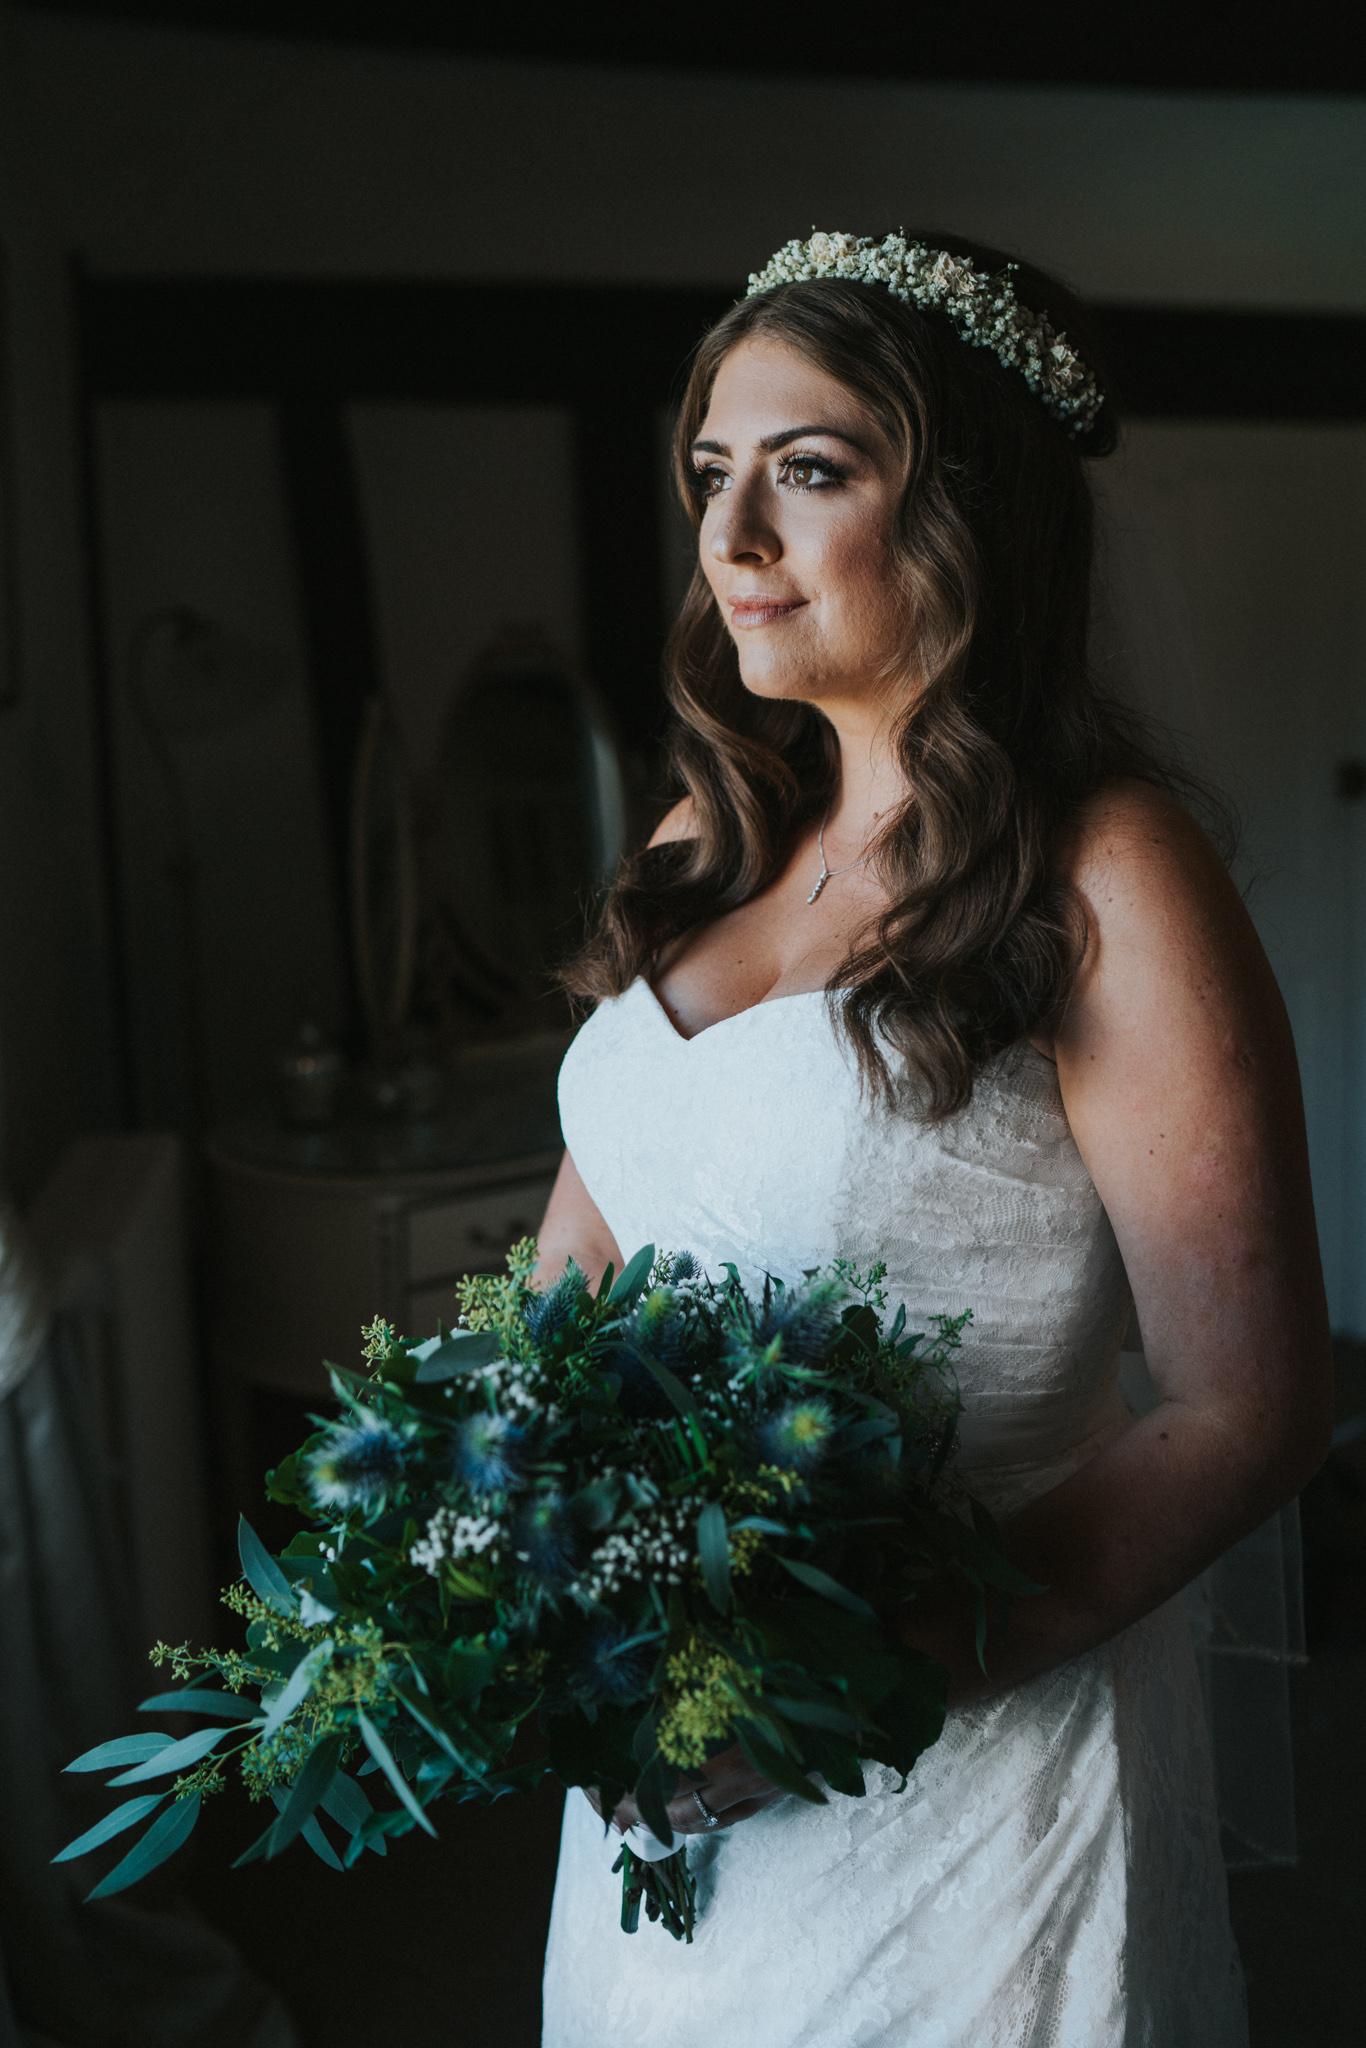 Sophie-Christian-Prested-Hall-Grace-Elizabeth-Previews-Essex-Norfolk-Suffolk-Devon-Alternative-Wedding-Photographer (3 of 20).jpg